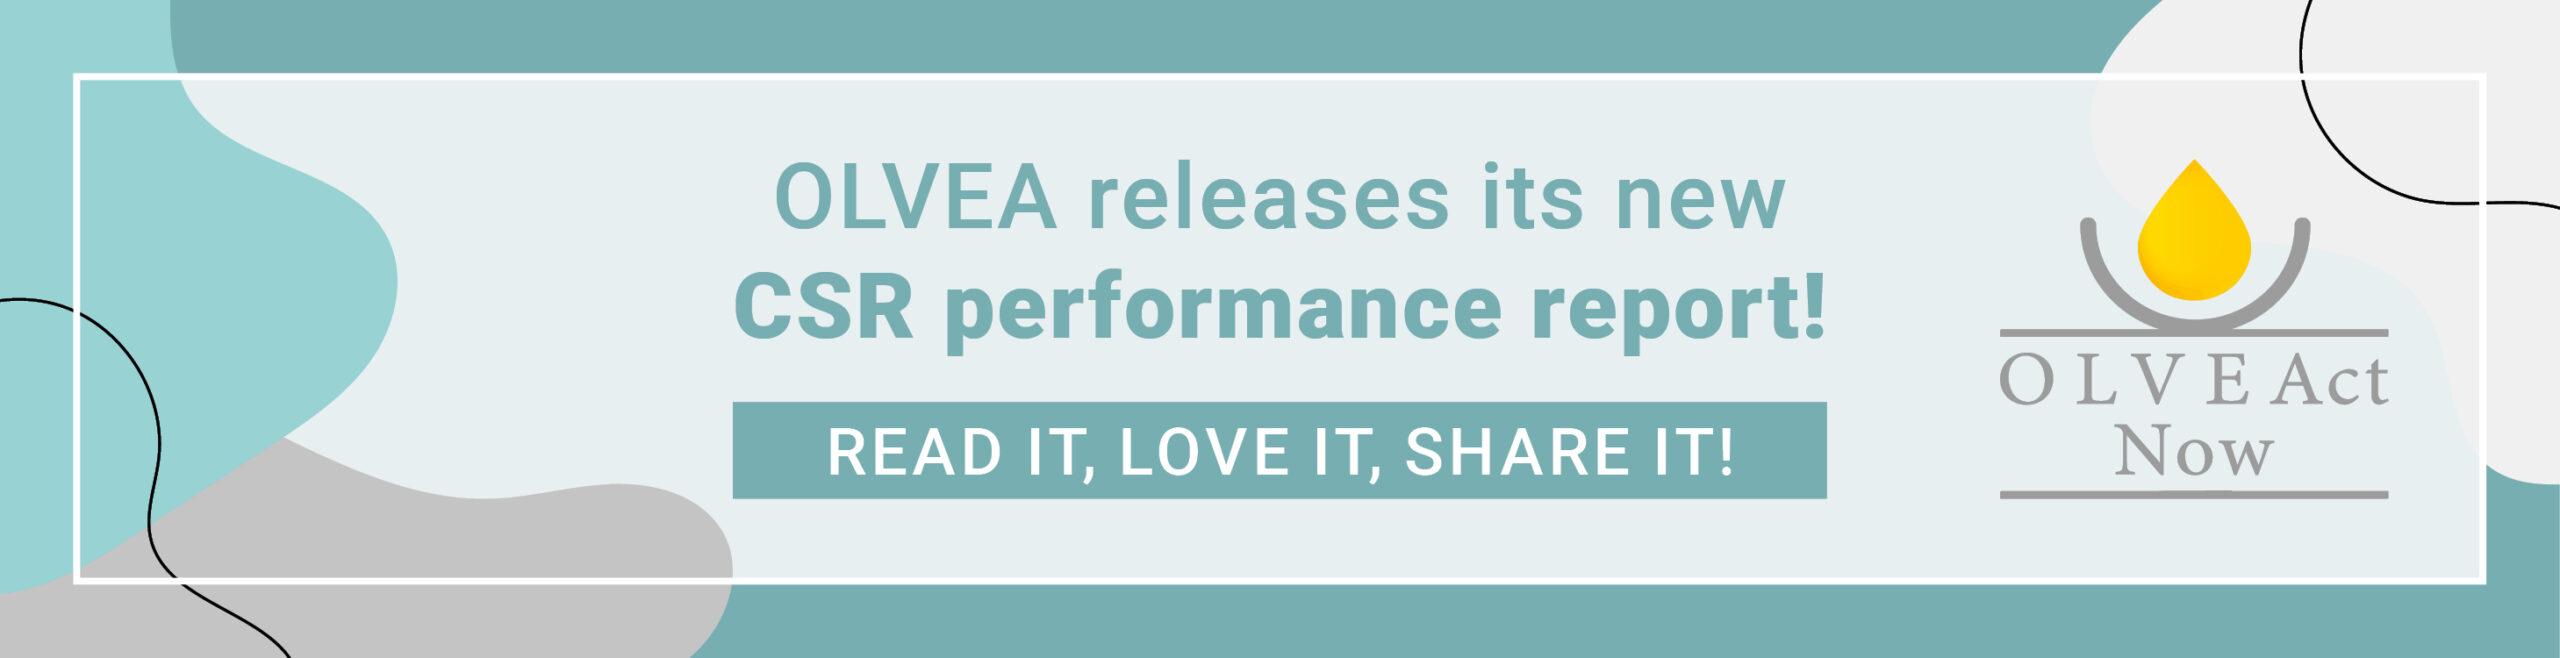 OLVEAct Now - CSR Performance report - Corporate Social Responsibility - OLVEA - 2020 - 2021